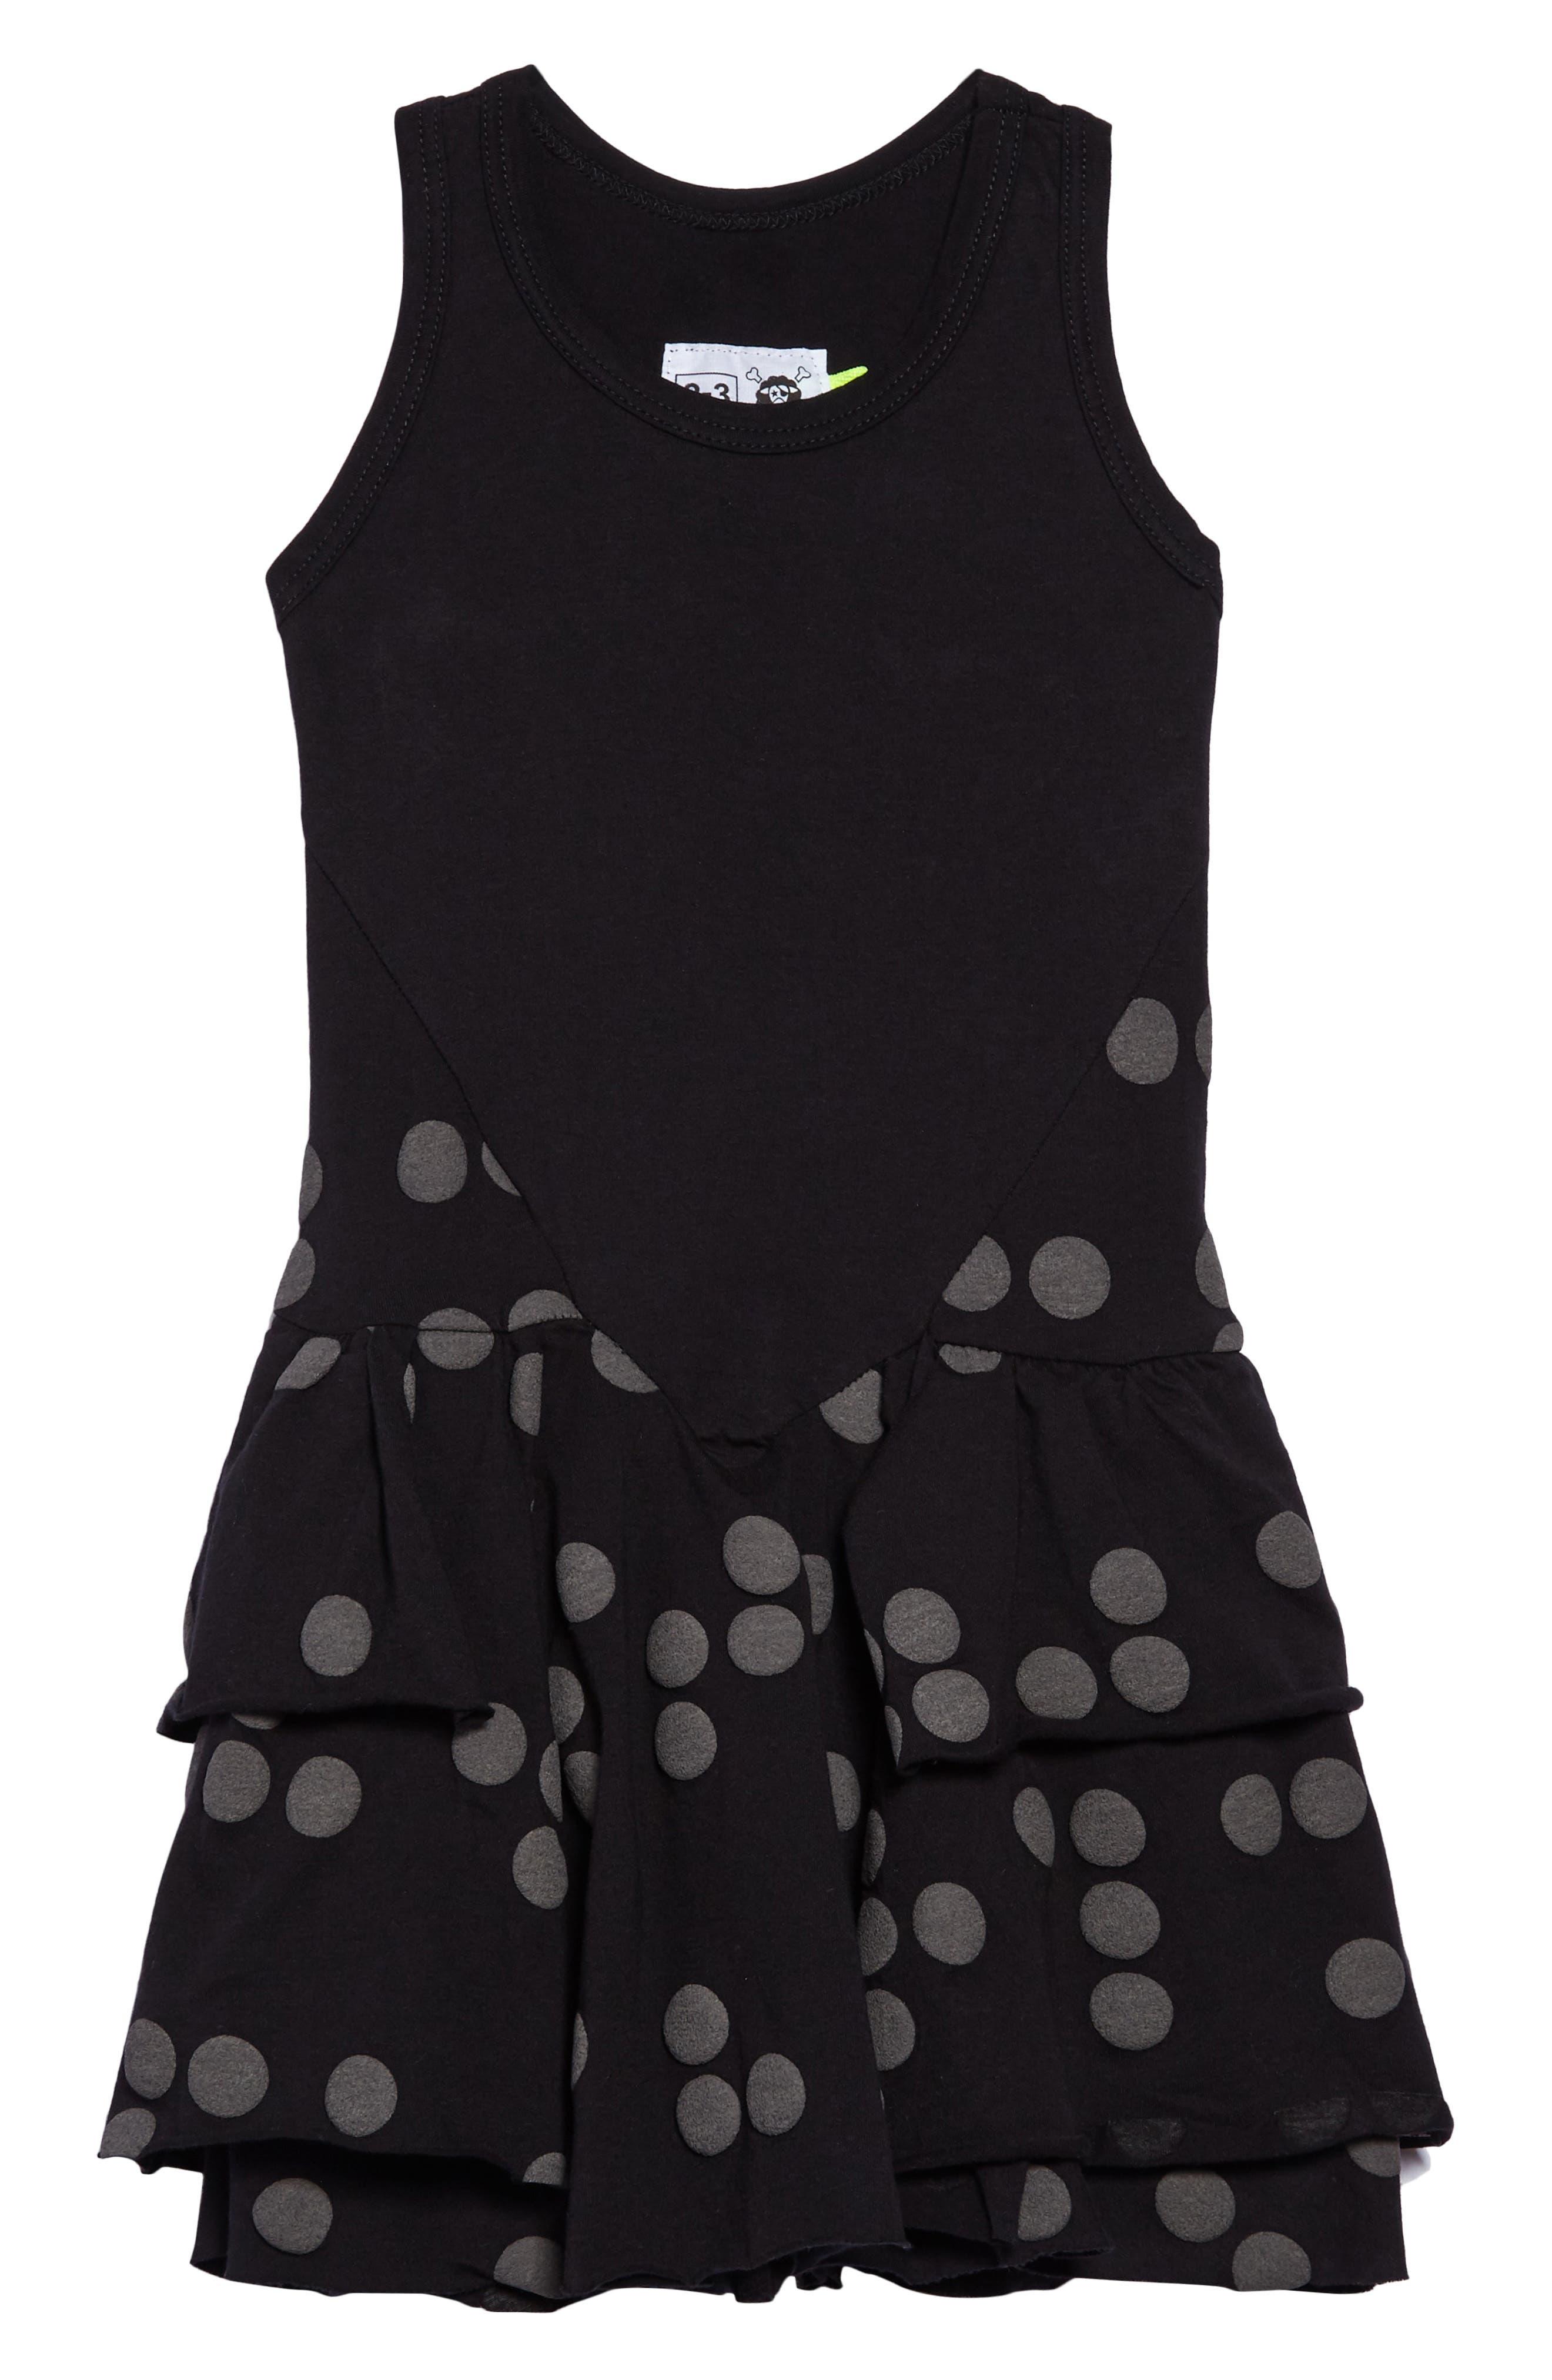 Nununu Braille Dot Layered Tank Dress (Toddler Girls & Little Girls)